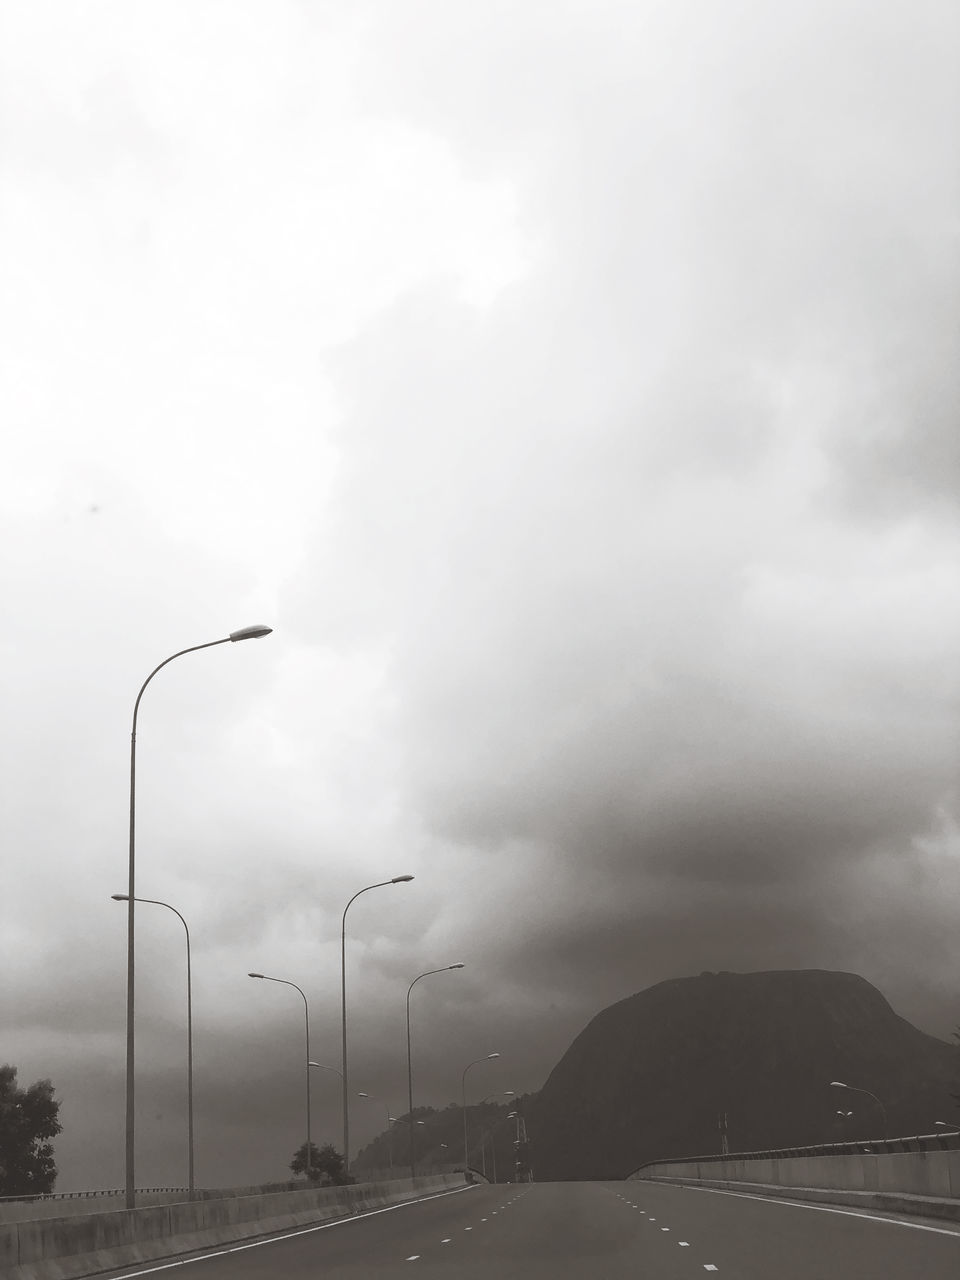 STREET LIGHTS AGAINST SKY